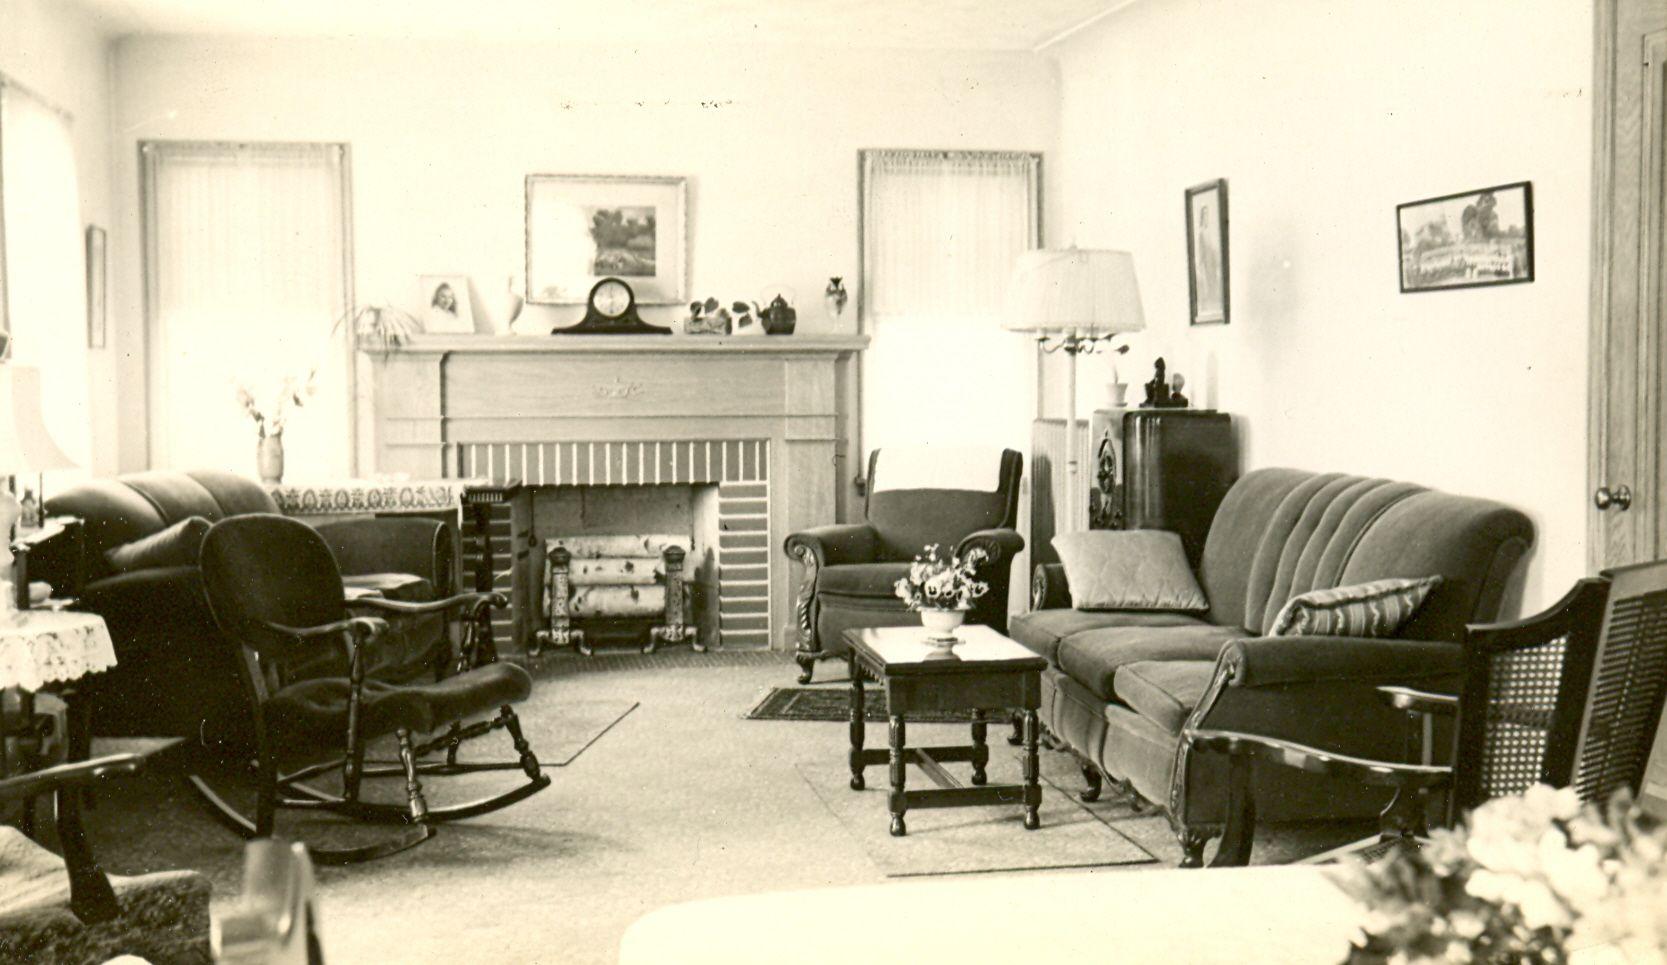 1940s Living Room I Like The Mantel Clock 1940s Living Room Home Living Room 1940s Home